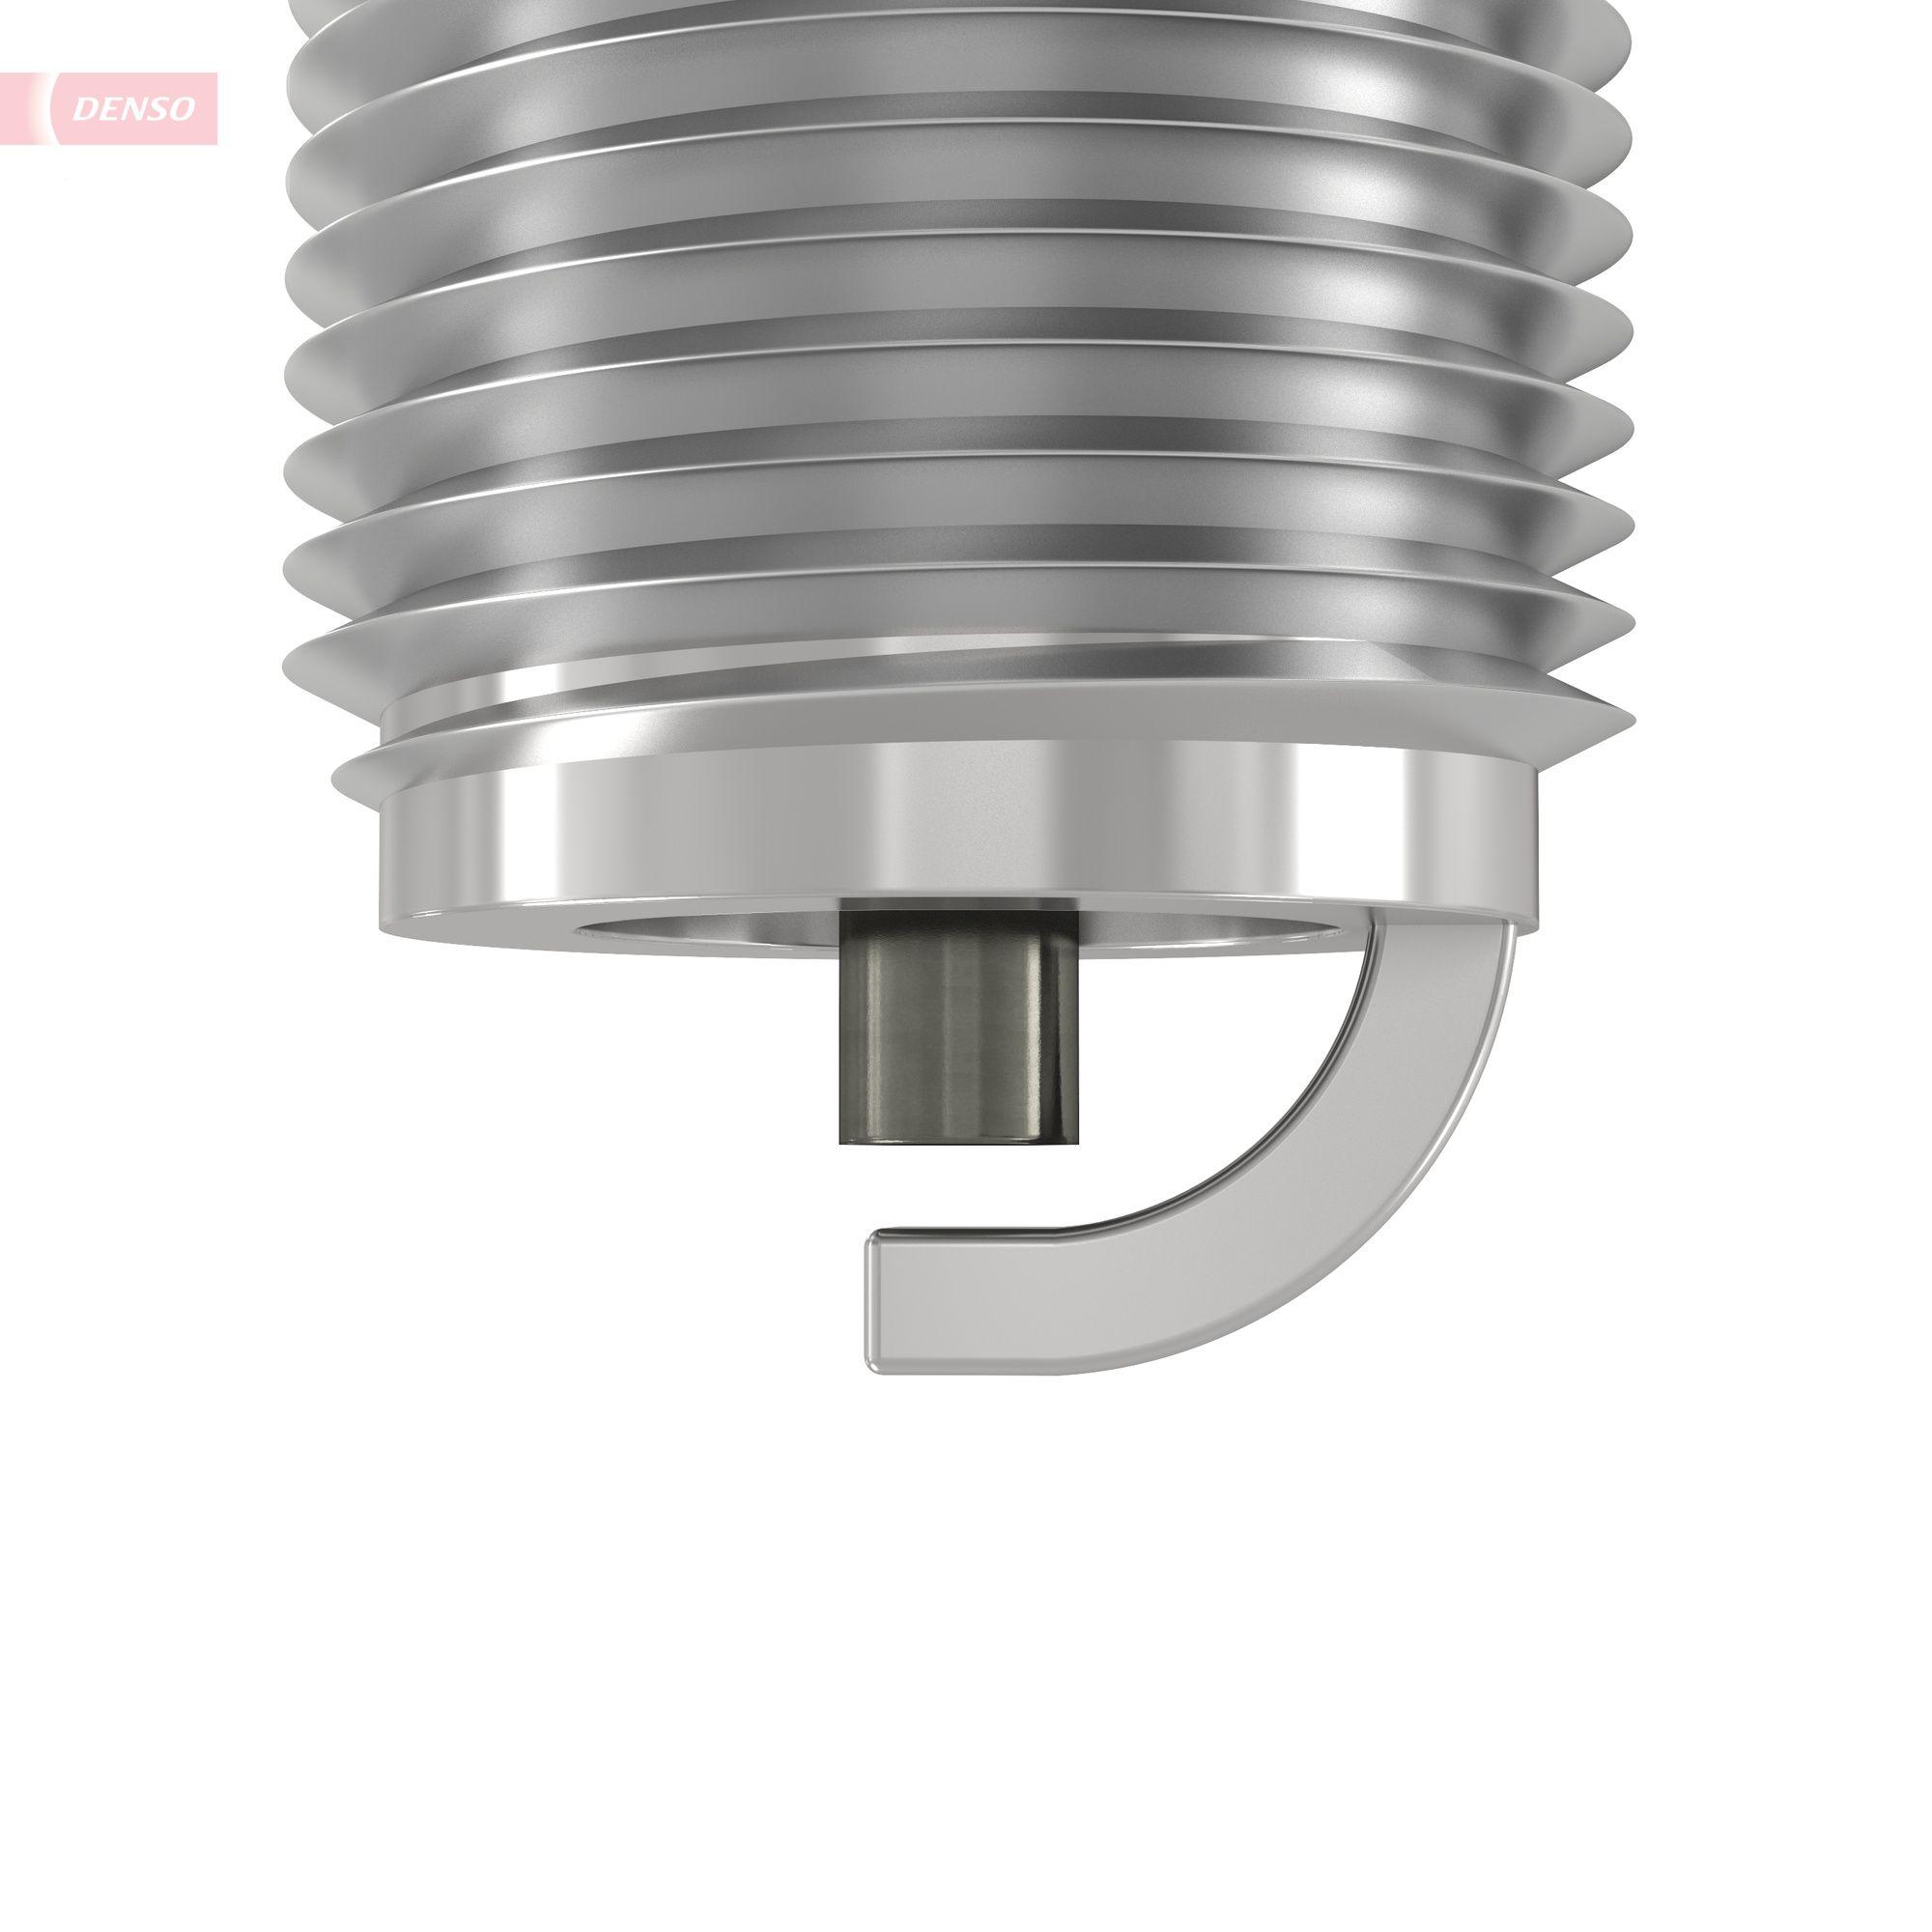 DENSO Nickel Tändstift N.vidd: 20.6 W24FR-L CF MOTO